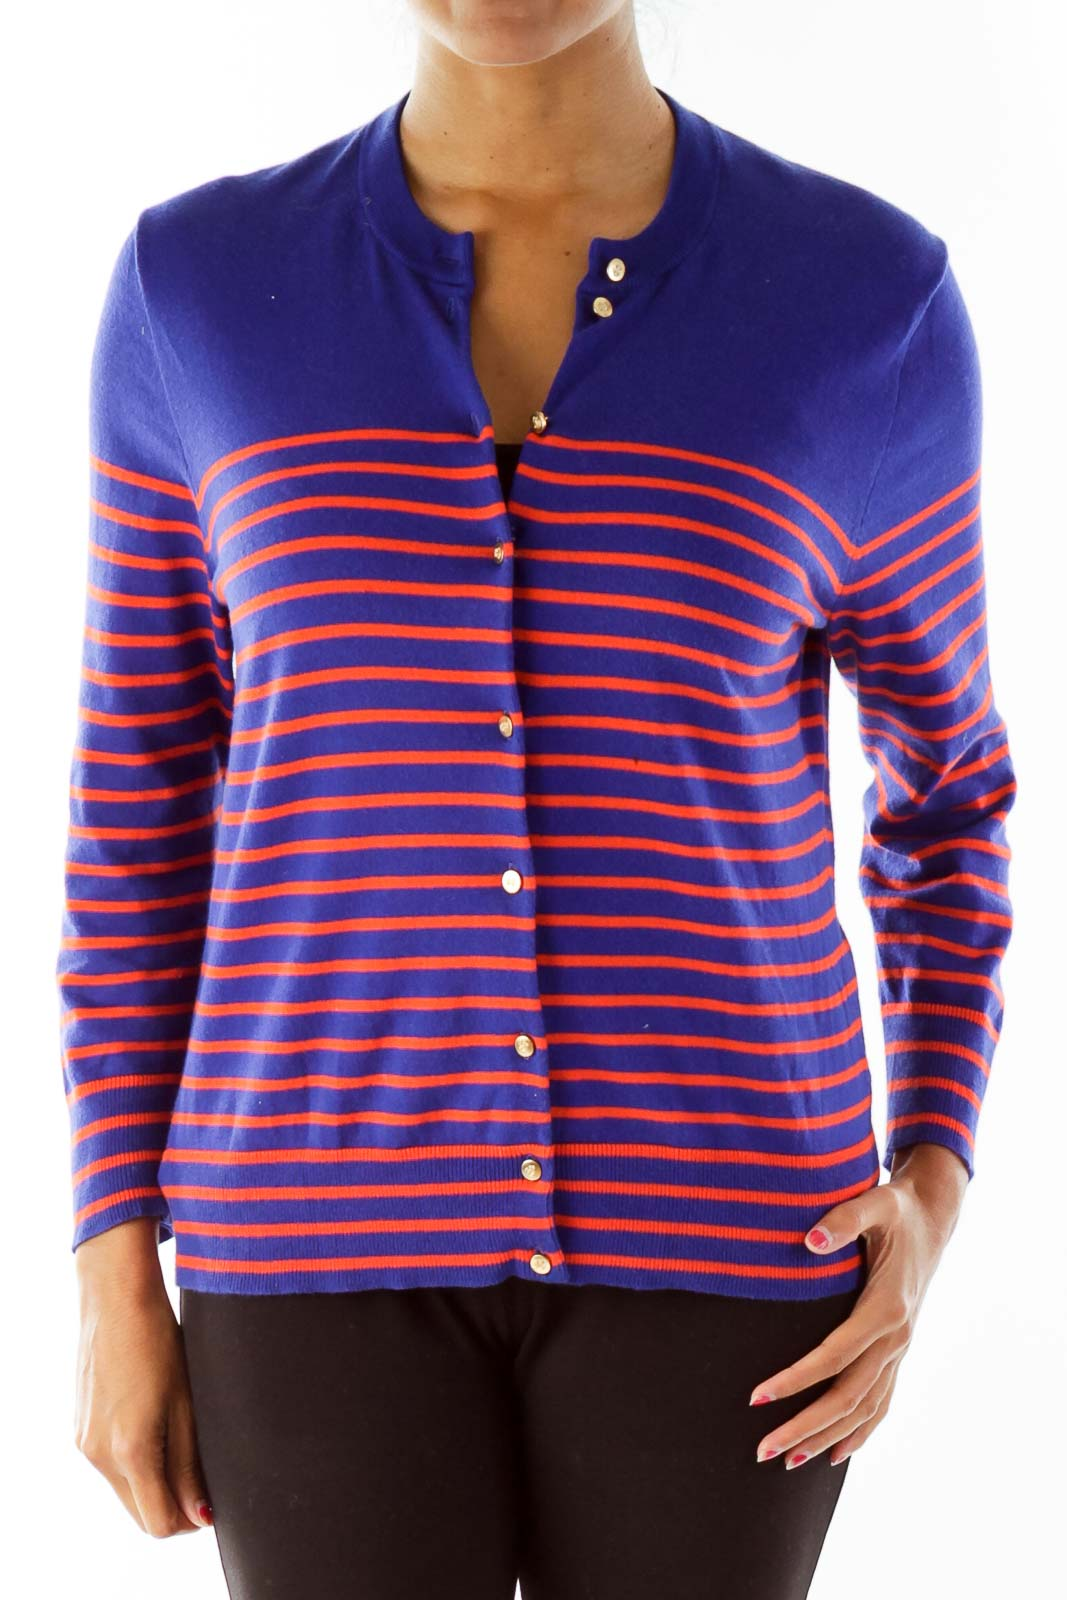 Blue Orange Striped Cardigan - SilkRoll